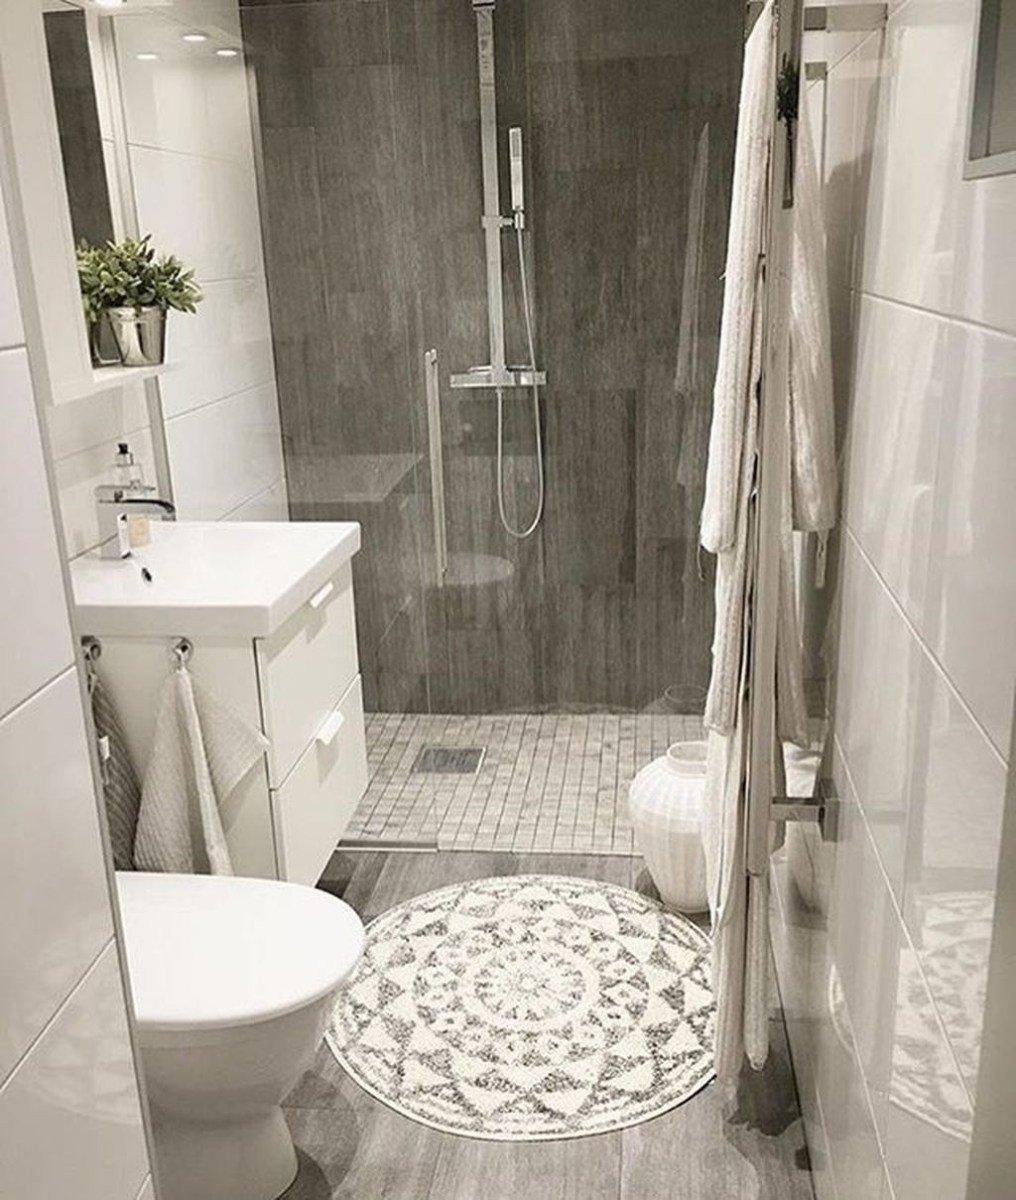 Small Bathroom Decor Ideas Pictures Luxury 39 Cool and Stylish Small Bathroom Design Ideas – Homedecorish